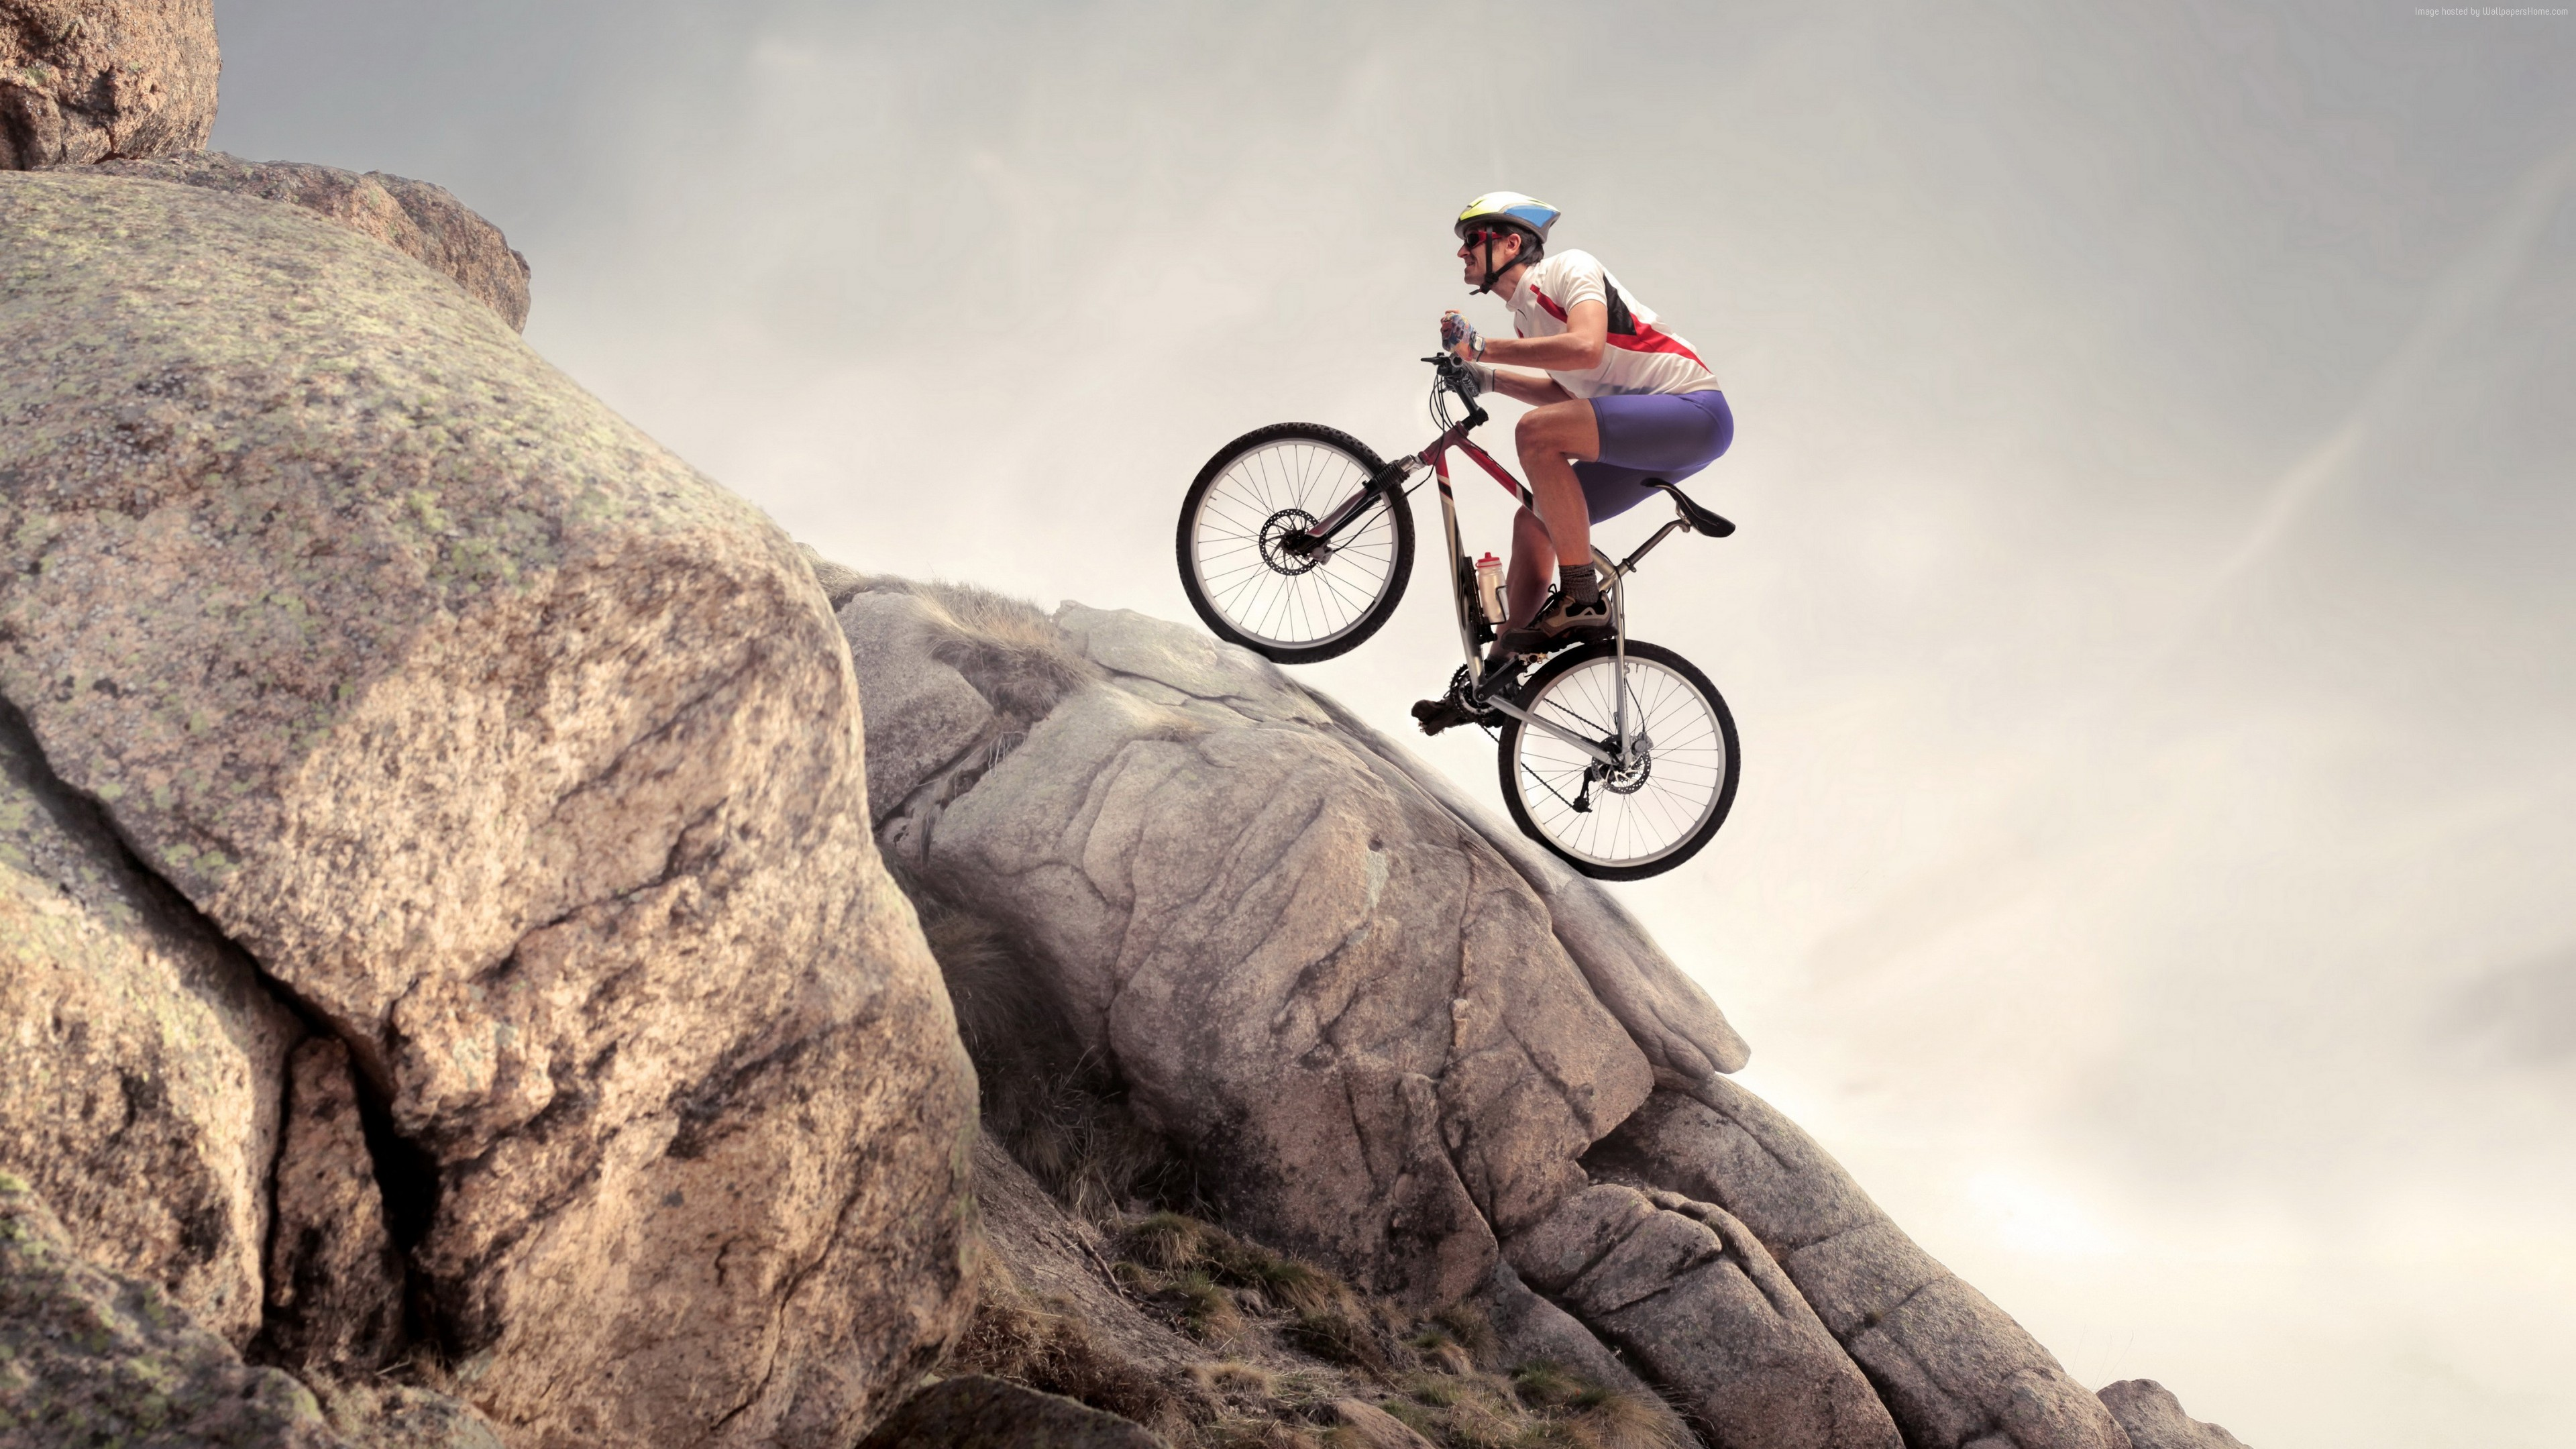 Wallpaper Rock Climbing Cycle Extreme Sport Wallpaper